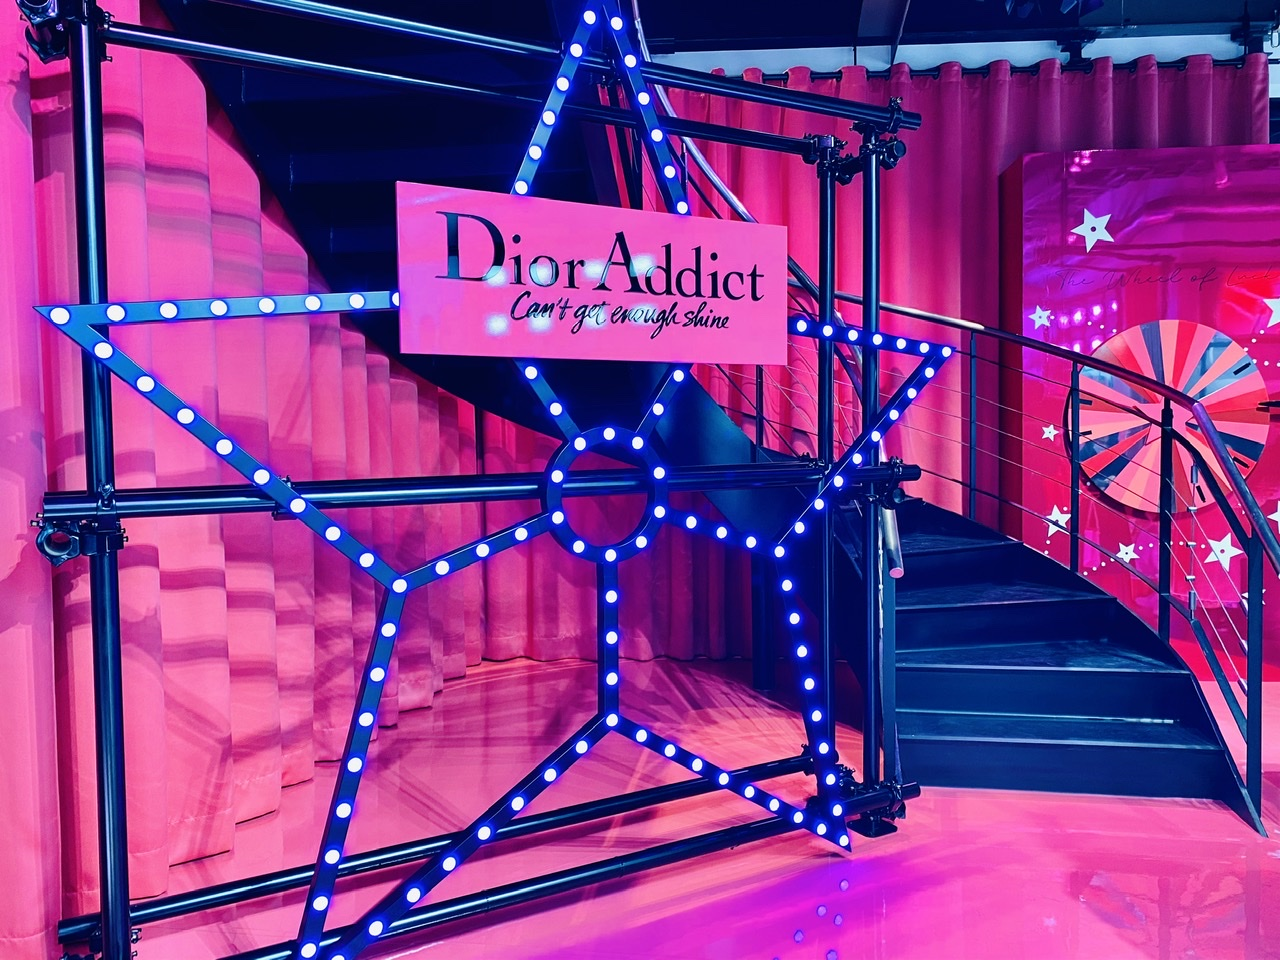 【Dior】豪華お土産付★新作リップをひと足早くお試し!連日大盛況のポップアップイベントへ♡_2